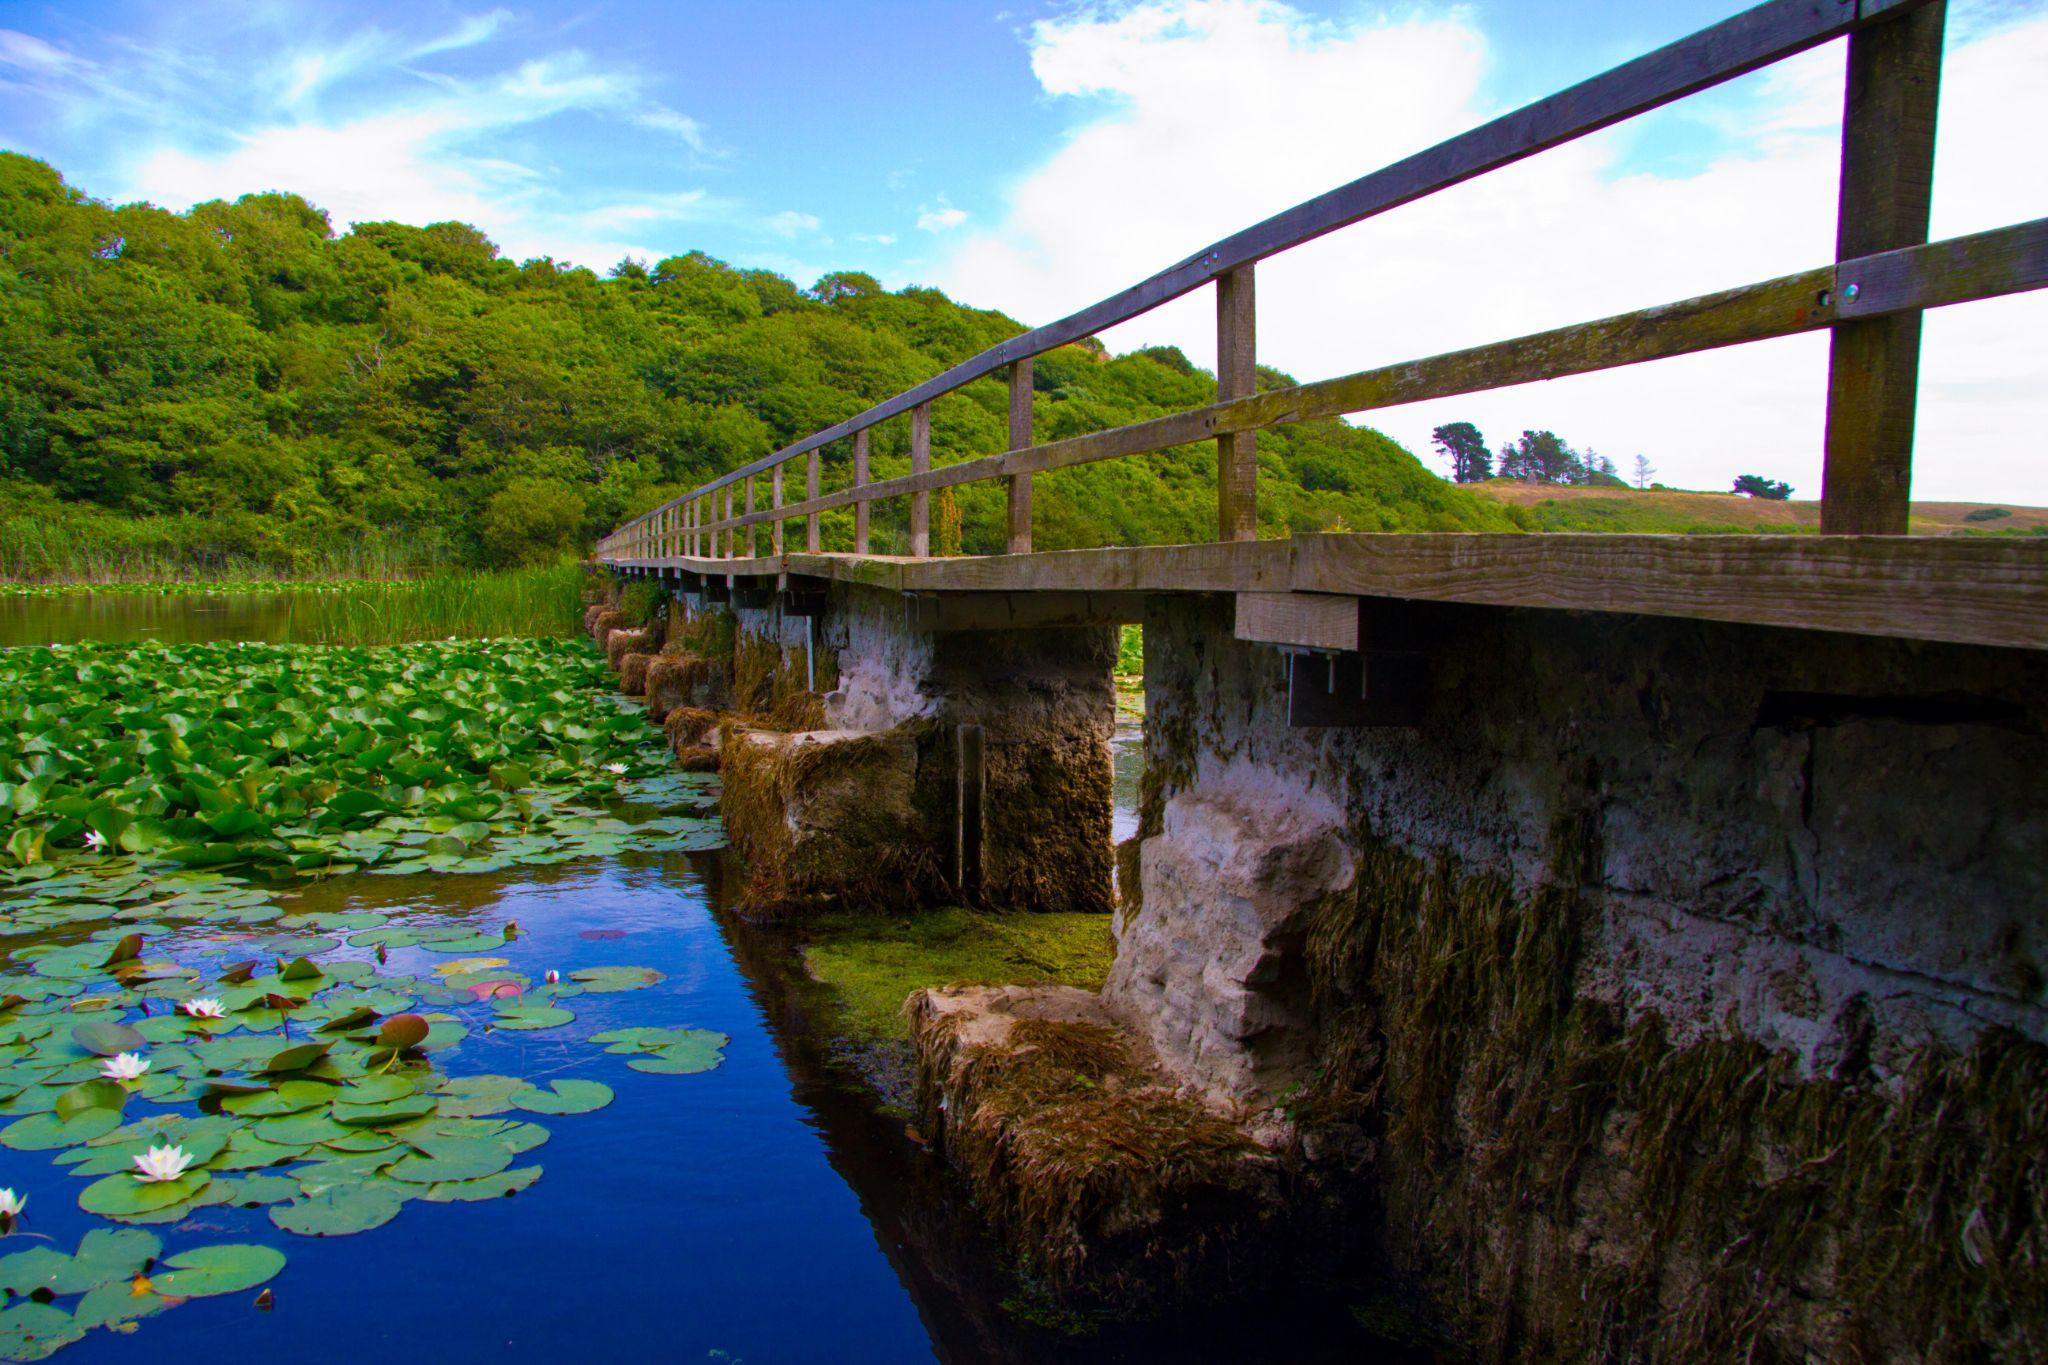 Bridge across the lake Bosherston lilly ponds by darron.sandell